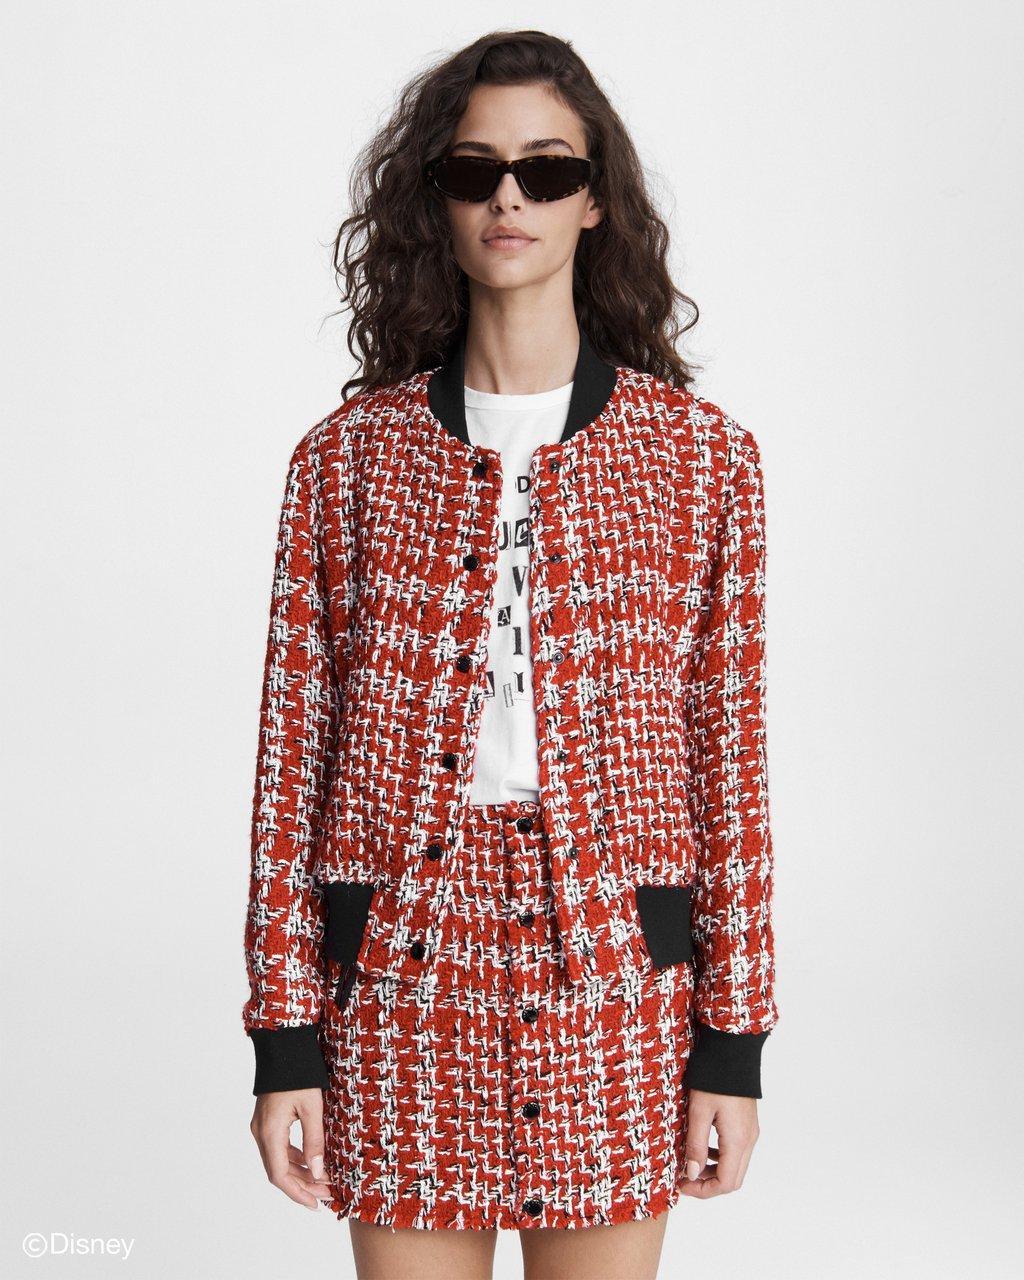 Rag-&-Bone-Cruella-collection-red-tweed-jacket-and-skirt